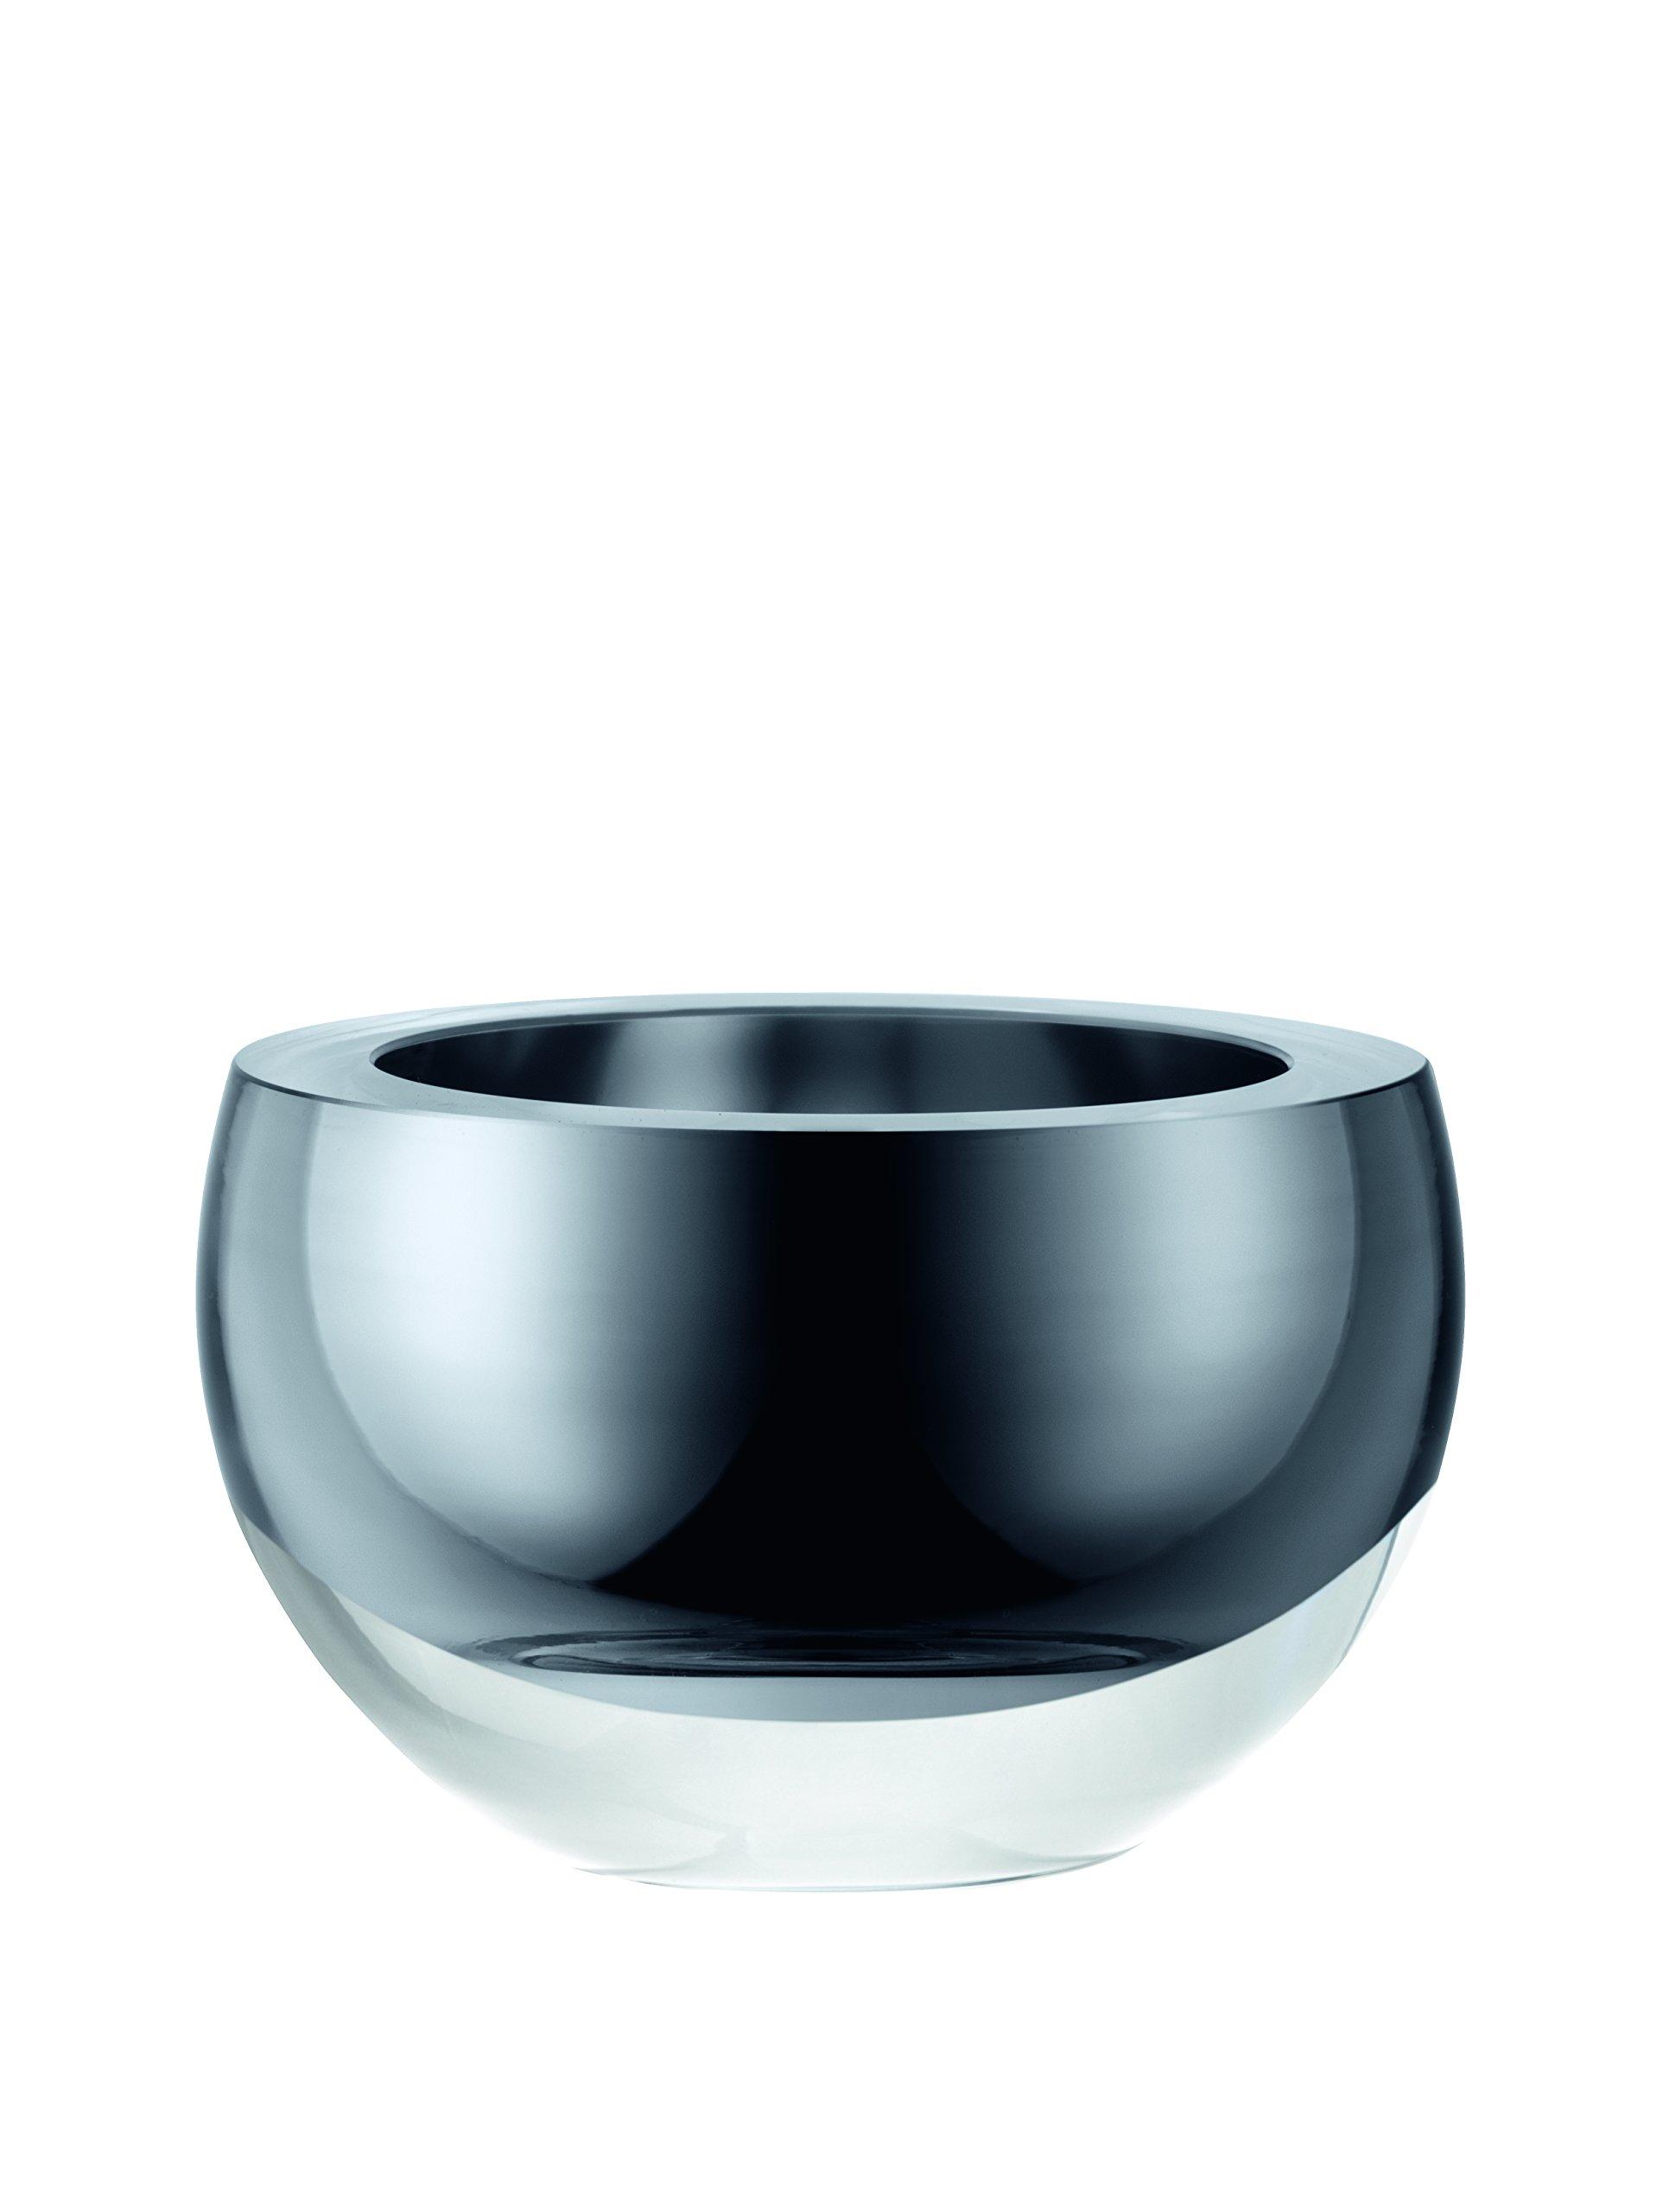 LSA International G1182-15-359 Host Decorative Bowl, Ø6in/H4in, Platinum